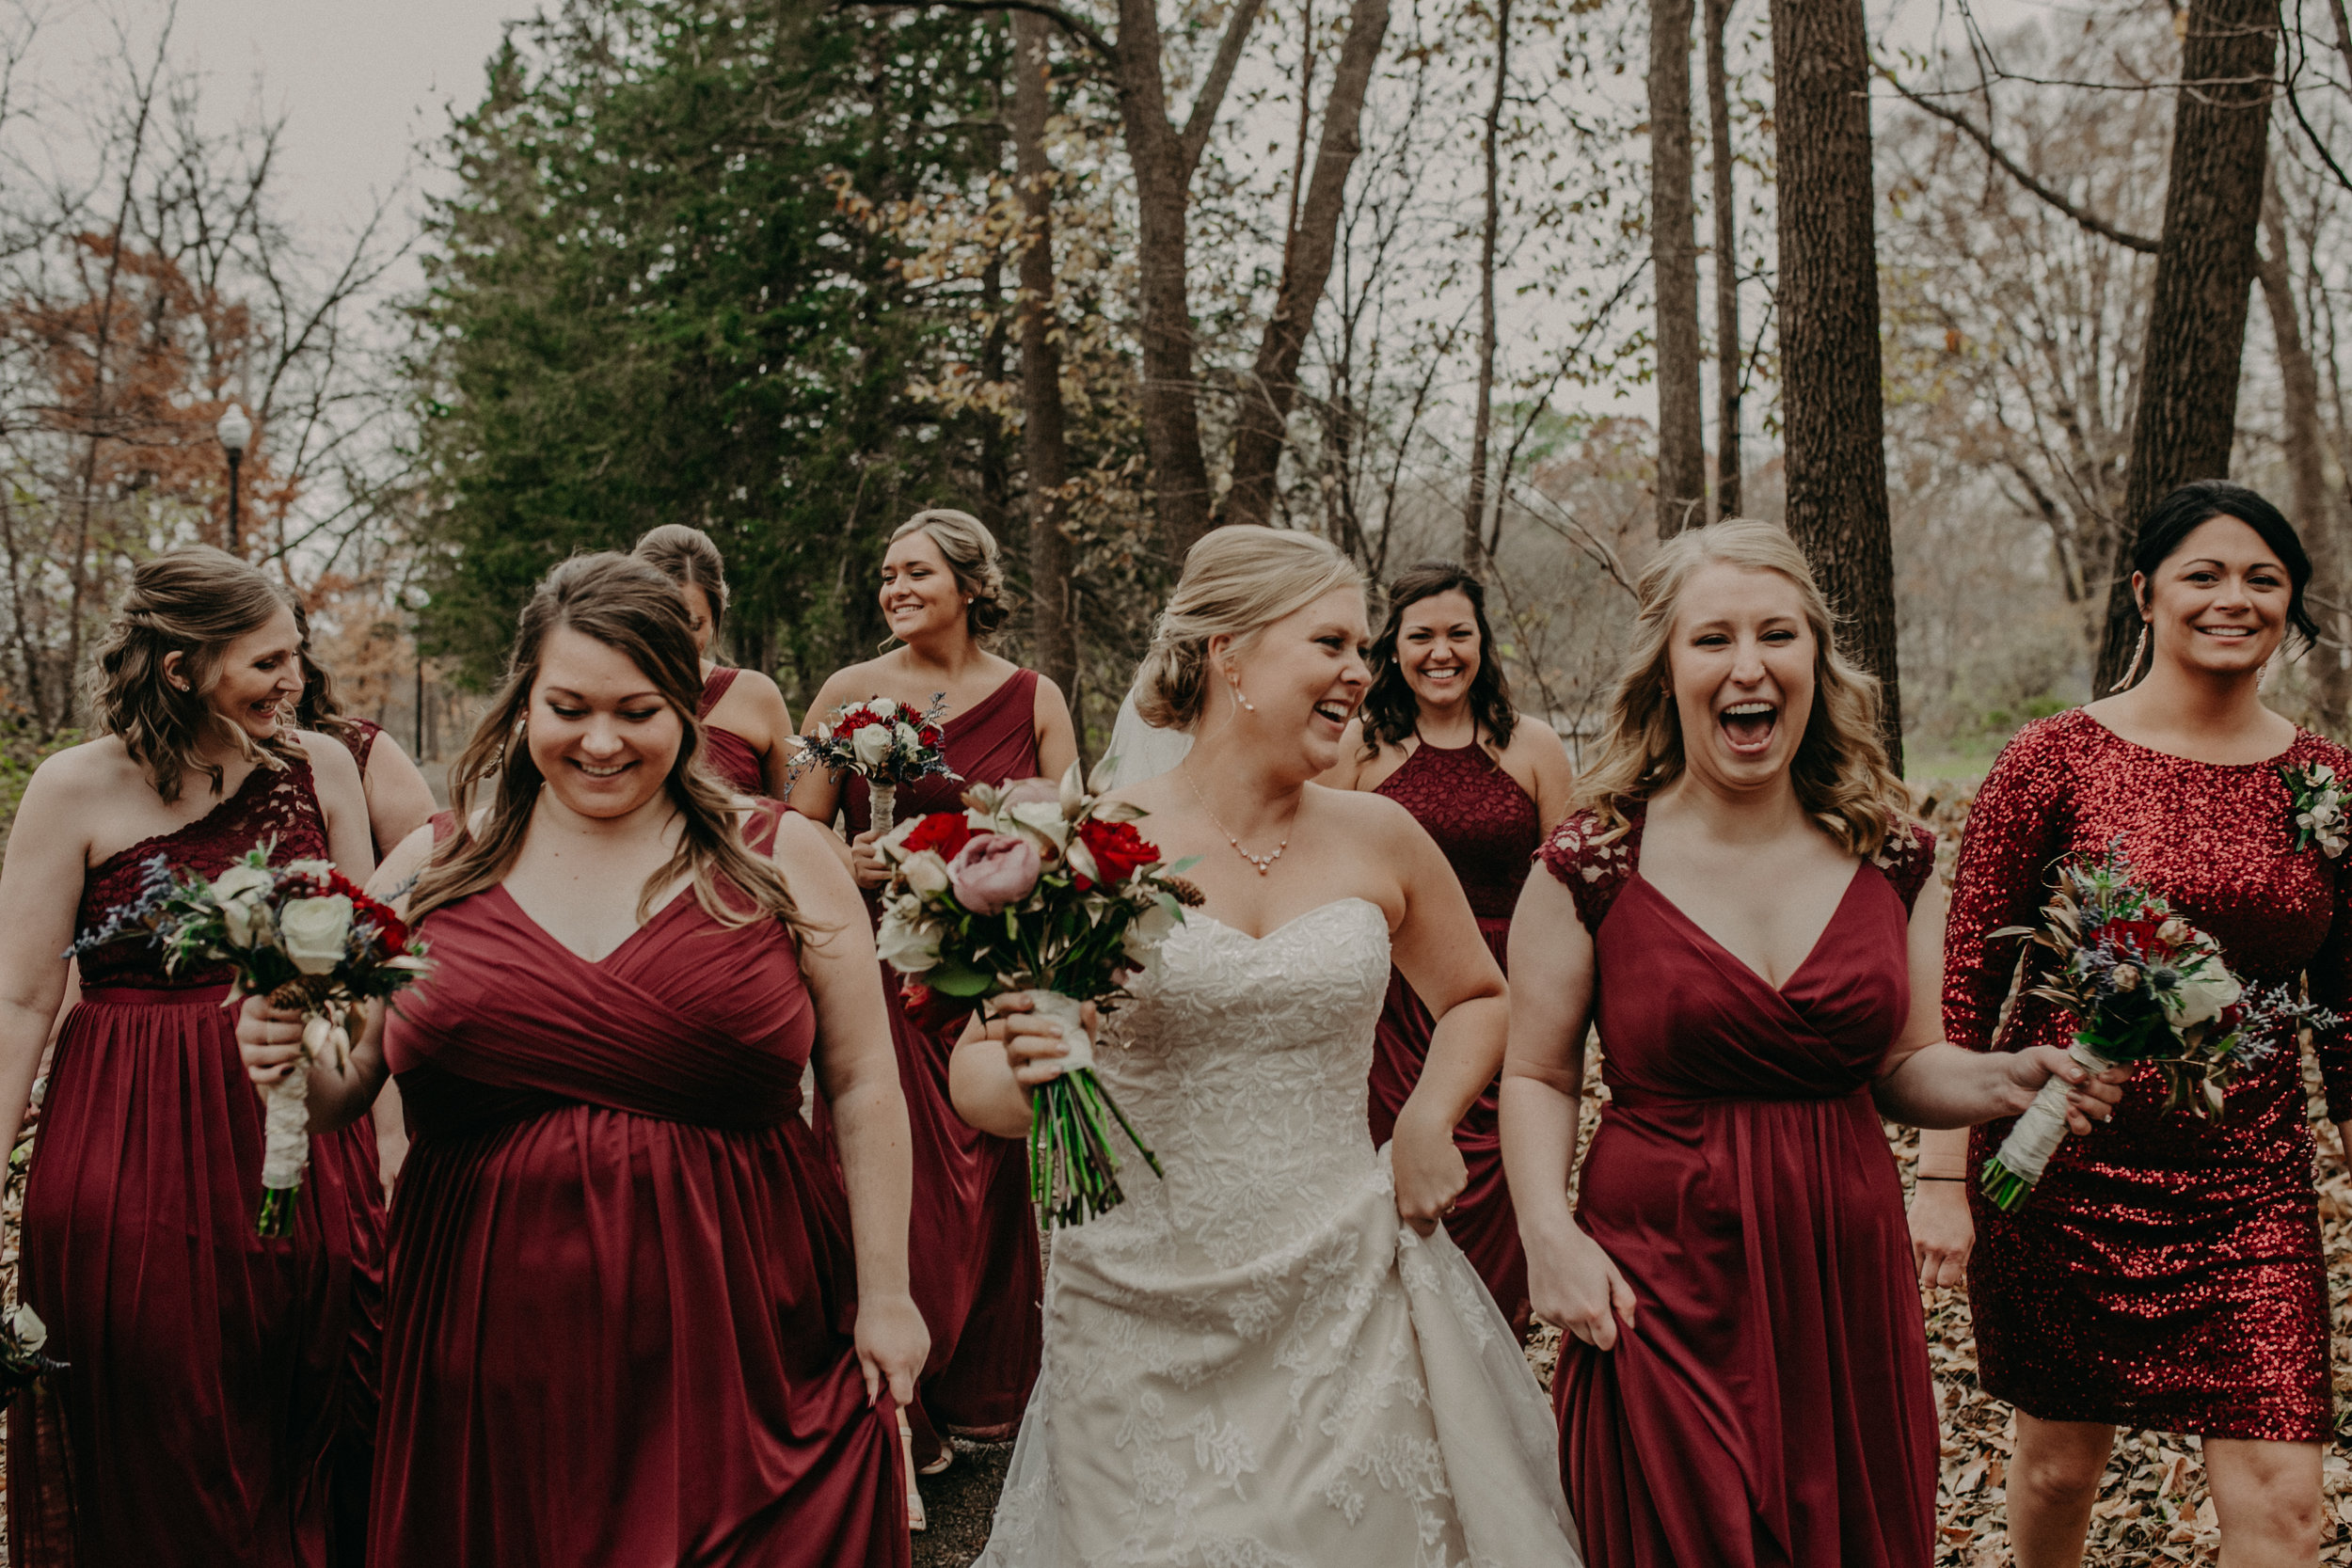 heritage-park-river-falls-wedding-bridal-party